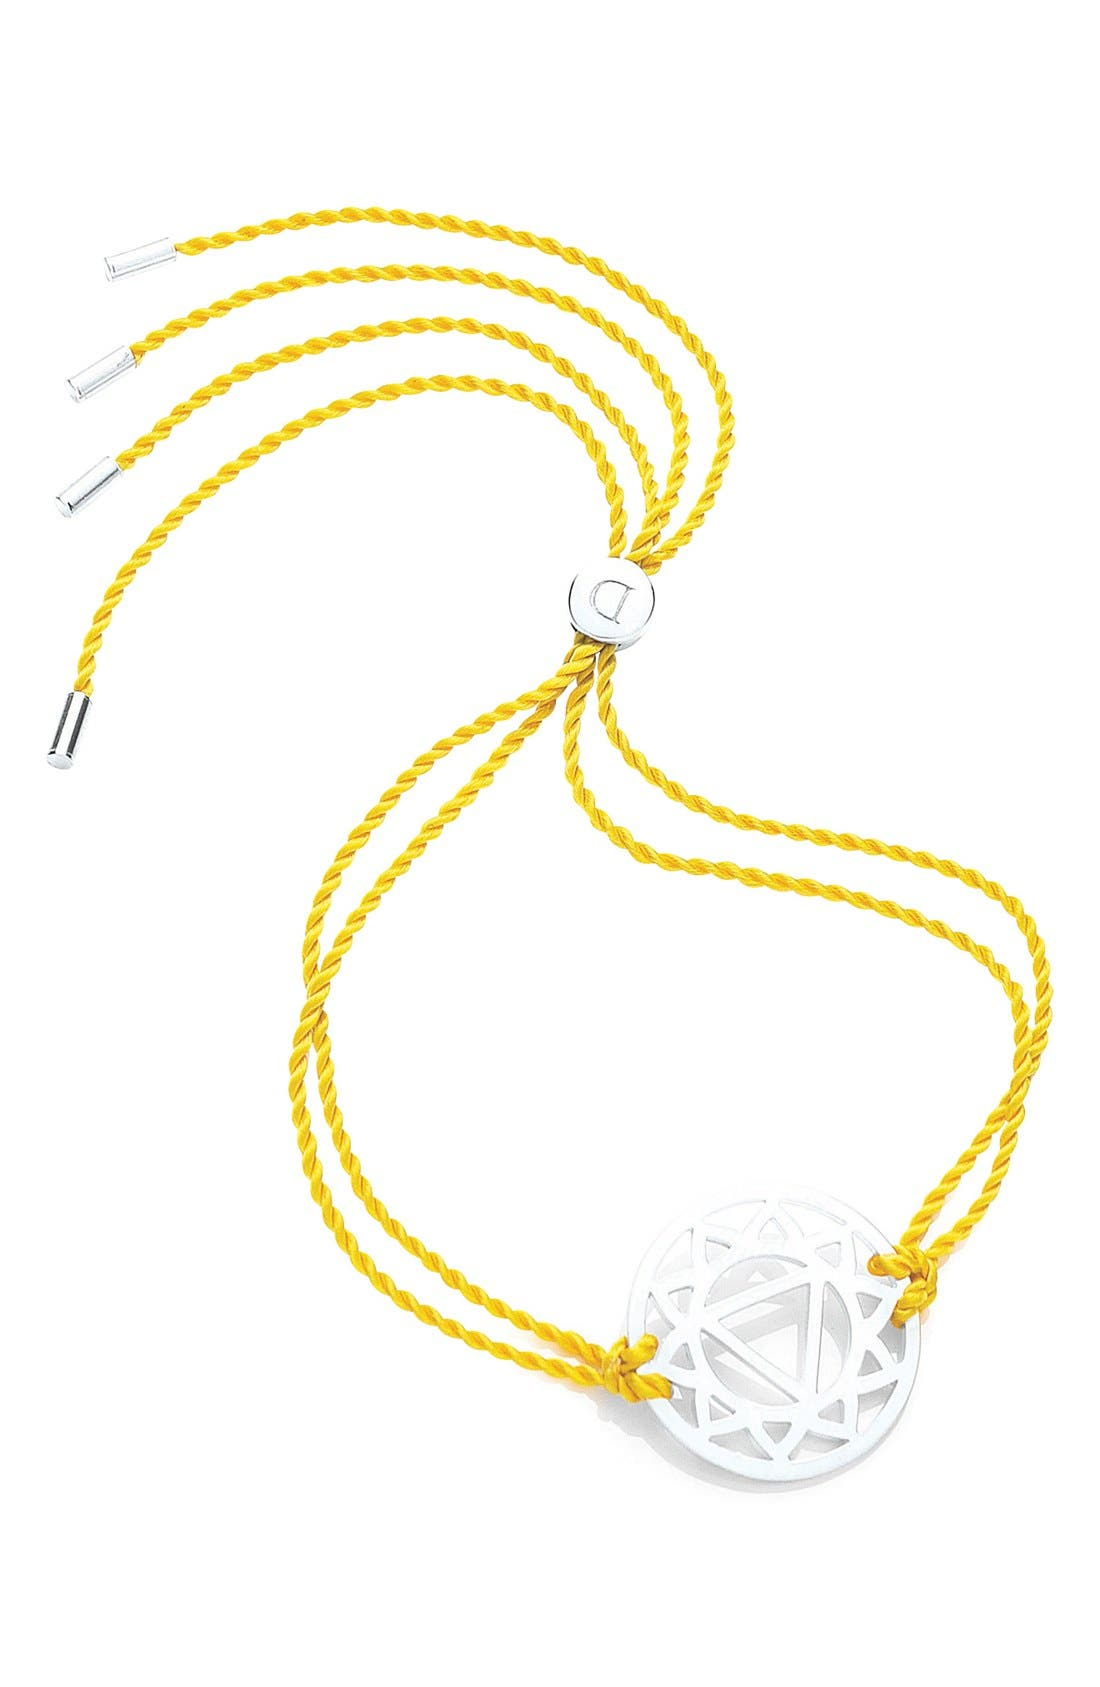 'Solar Plexus Chakra' Cord Bracelet,                             Main thumbnail 1, color,                             700